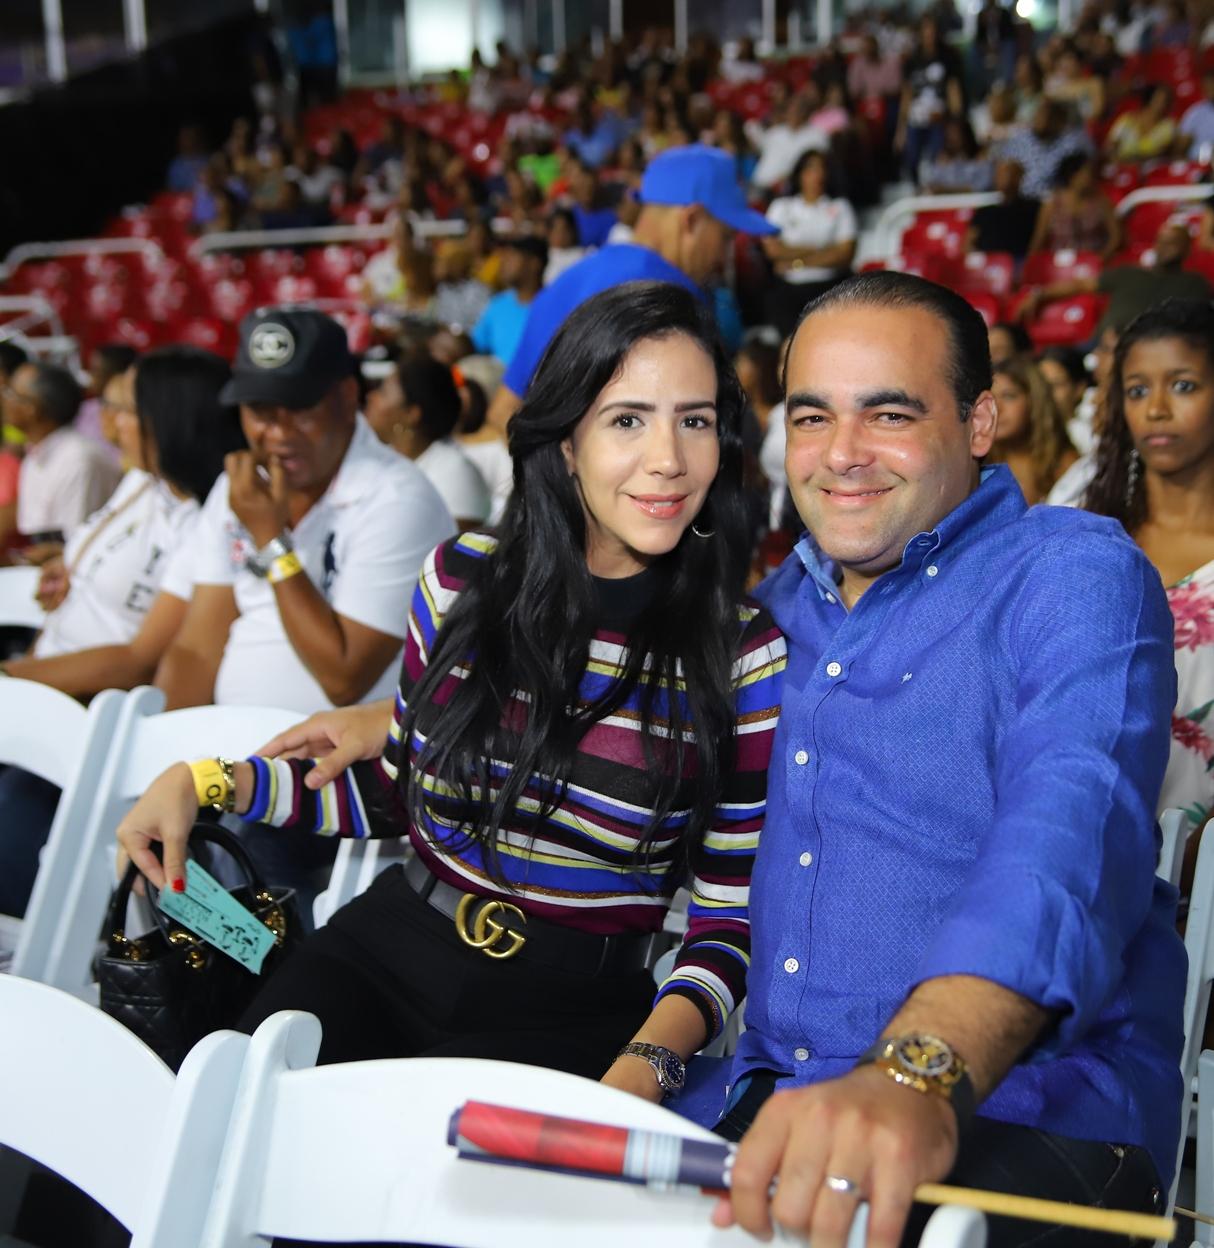 6. Katterin Garcia y Robert de la Cruz